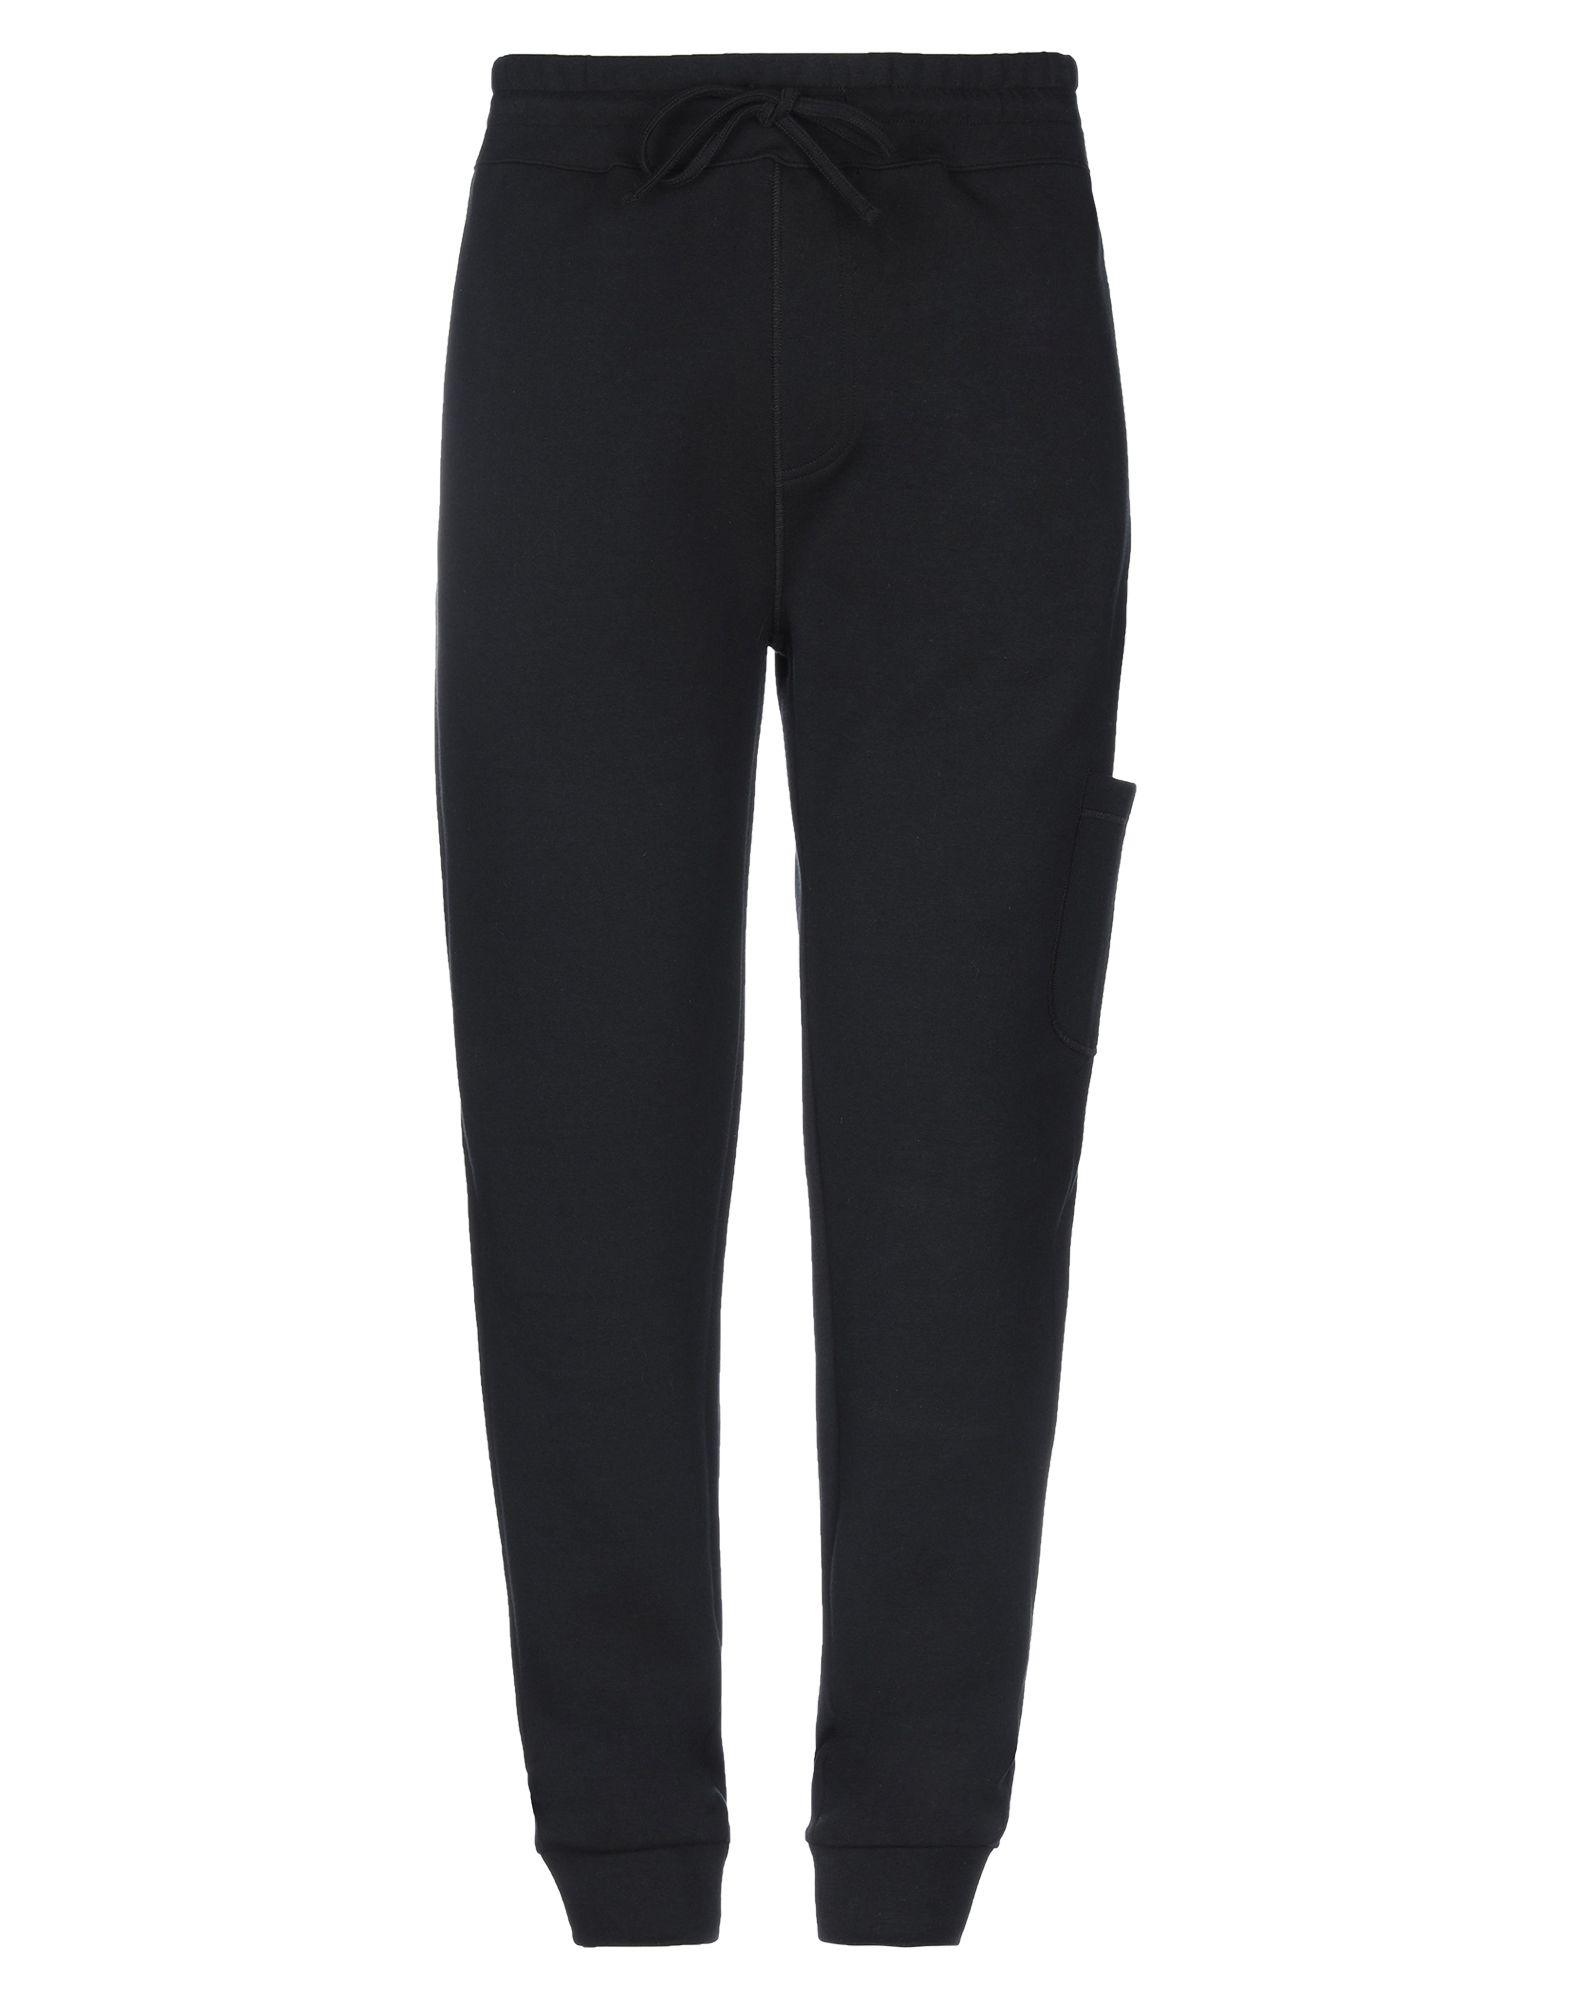 MC2 SAINT BARTH Casual pants. sweatshirt fleece, solid color, logo, mid rise, comfort fit, tapered leg, drawstring closure, multipockets. 100% Cotton